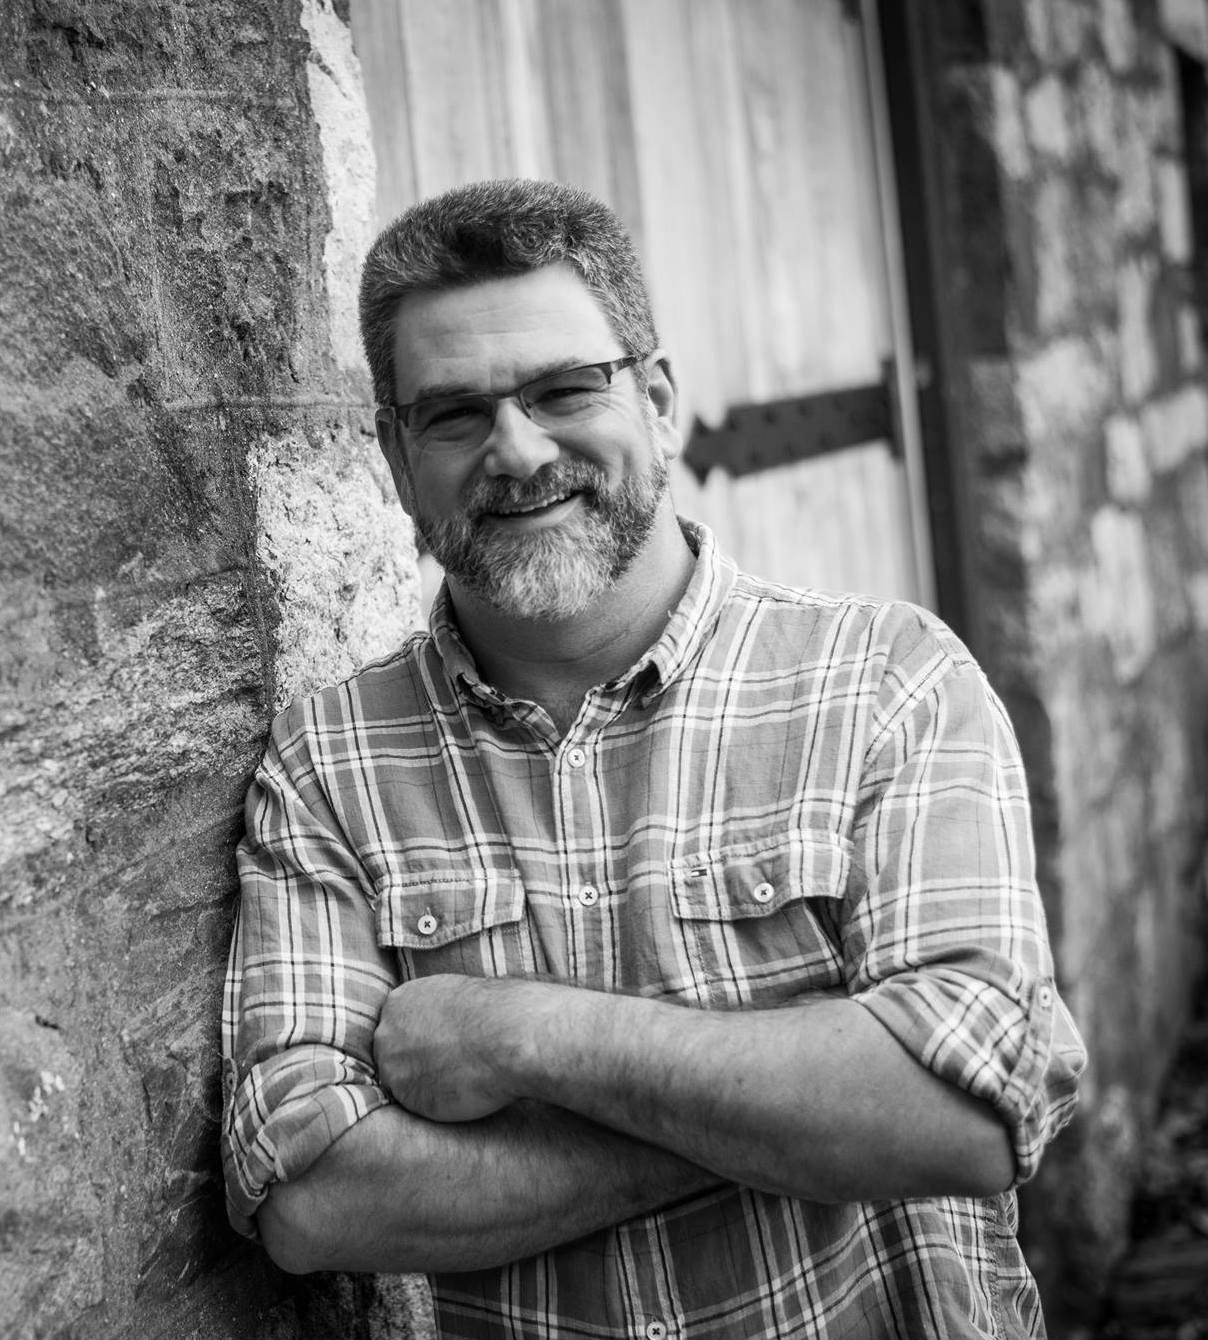 Christopher Golden is the author of recent novel ARARAT.